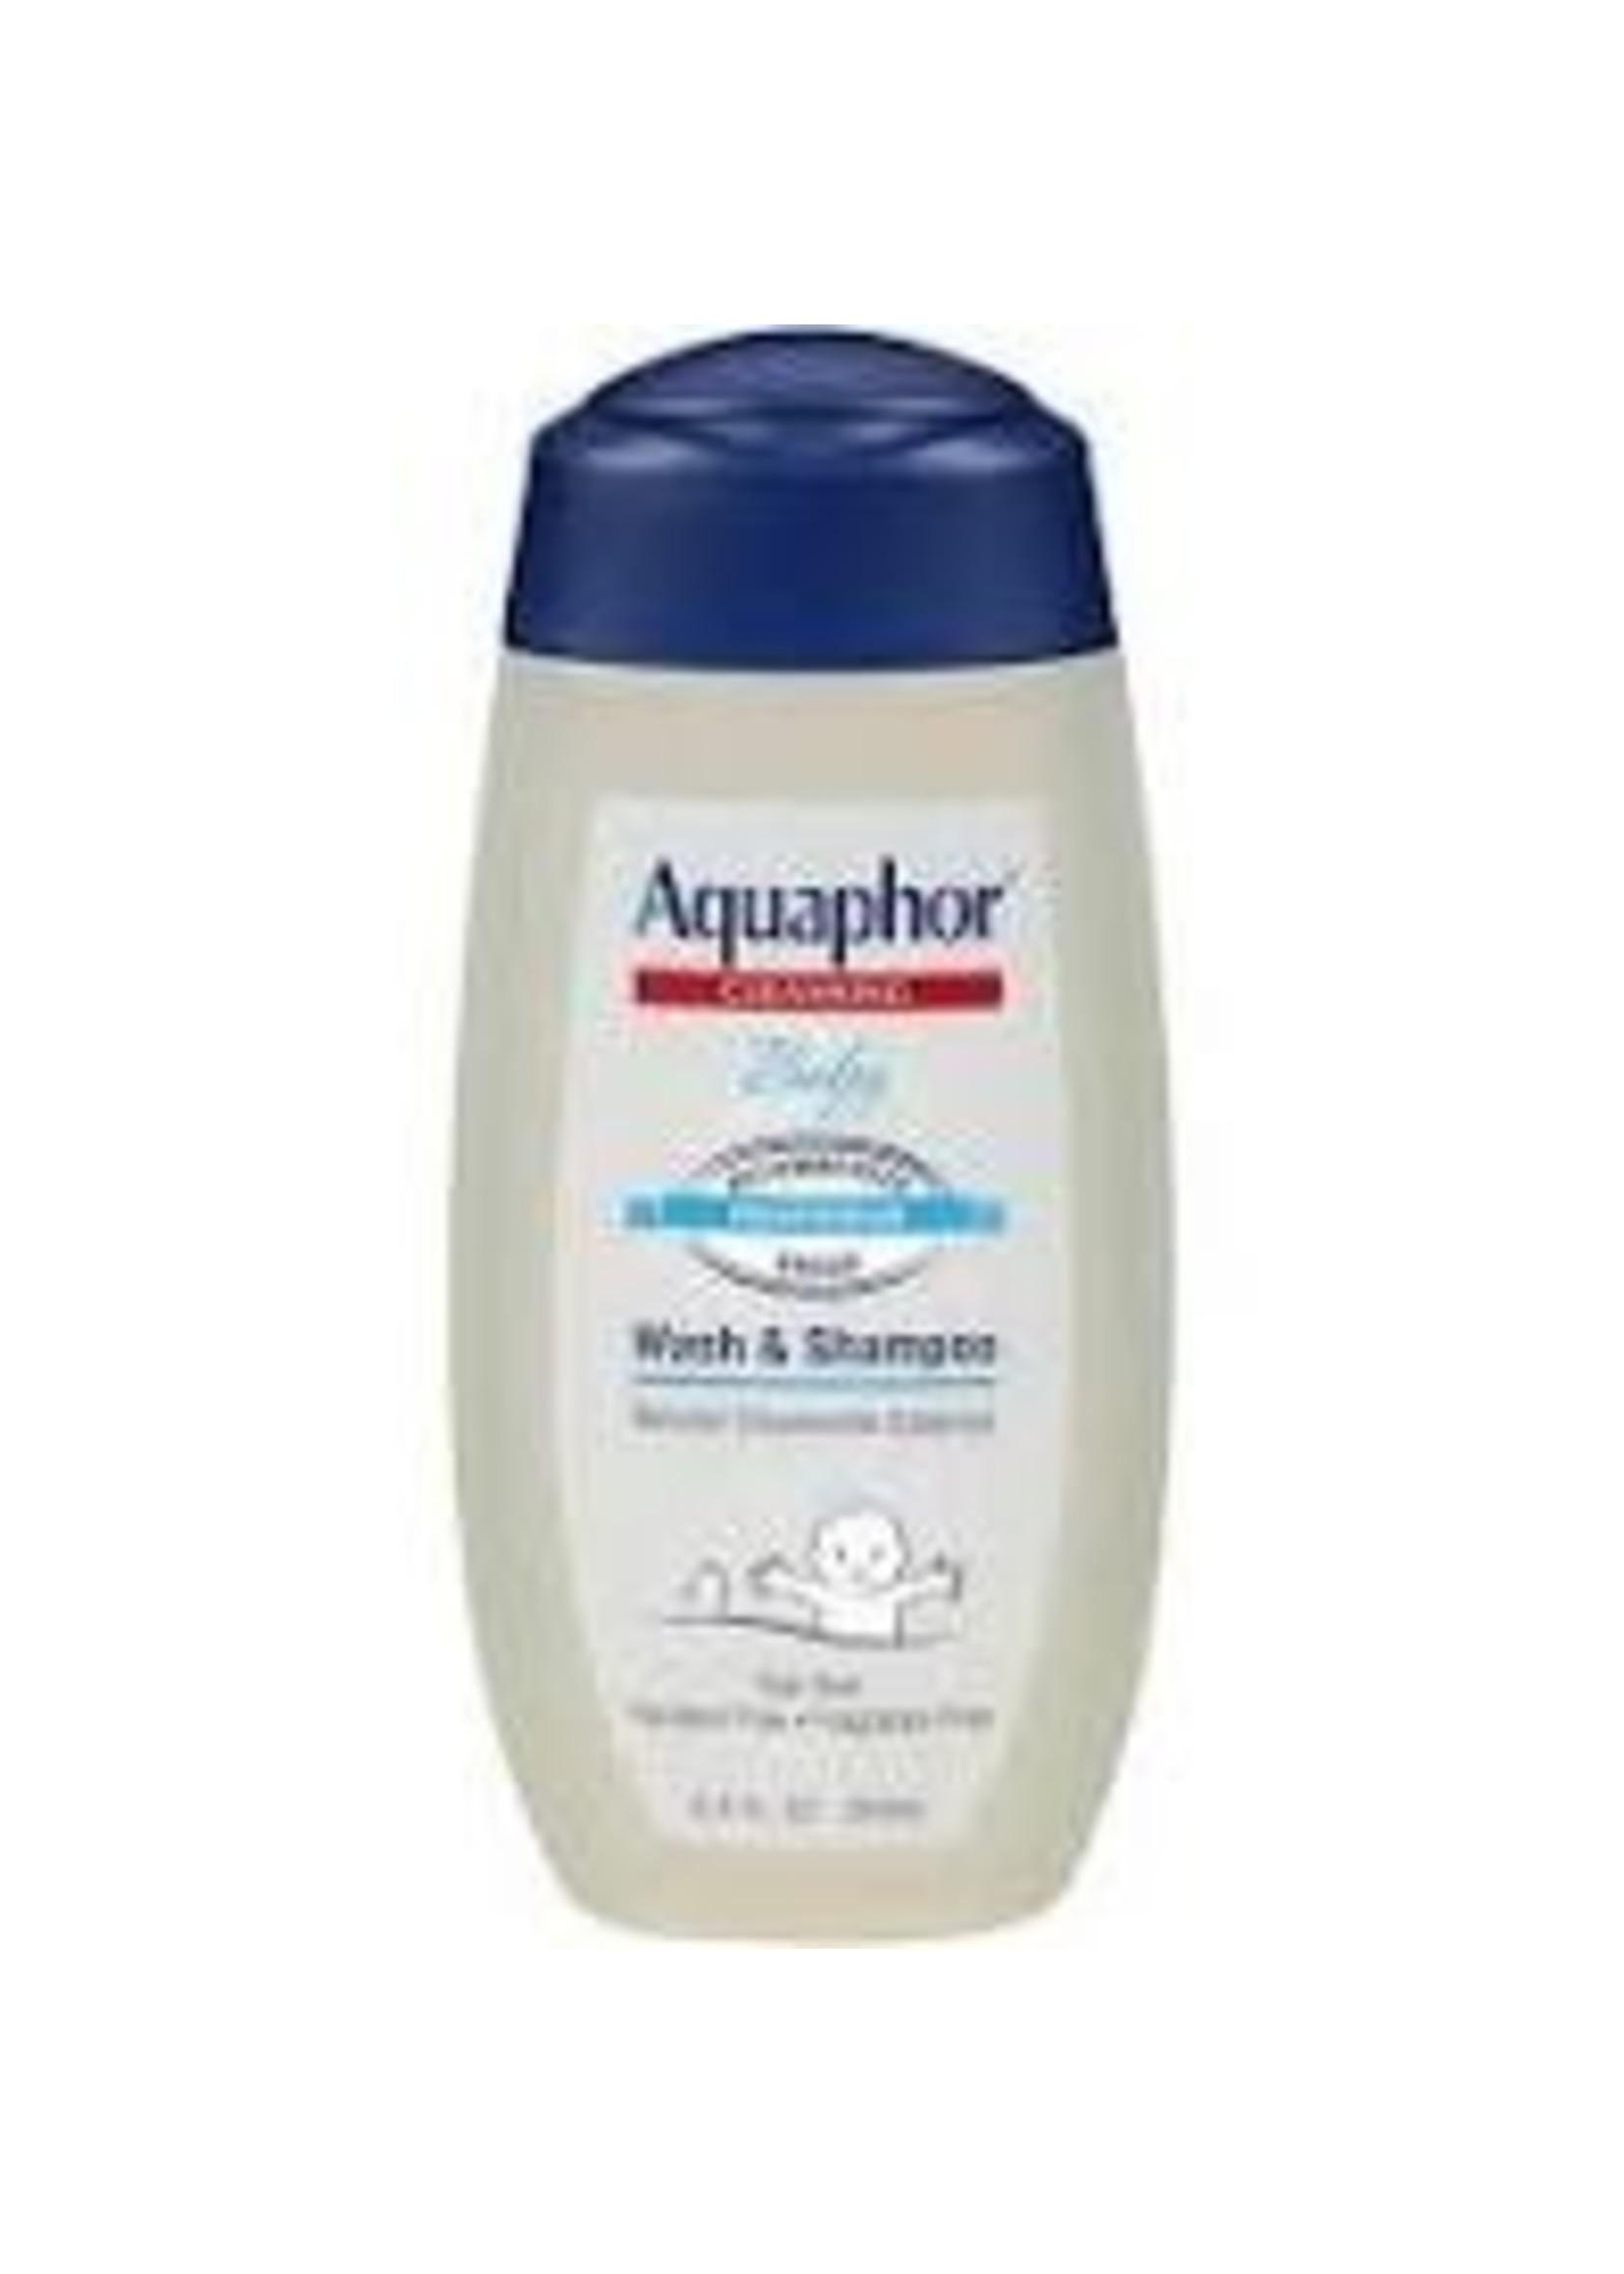 Aquaphor Baby Cleansing Wash & Shampoo